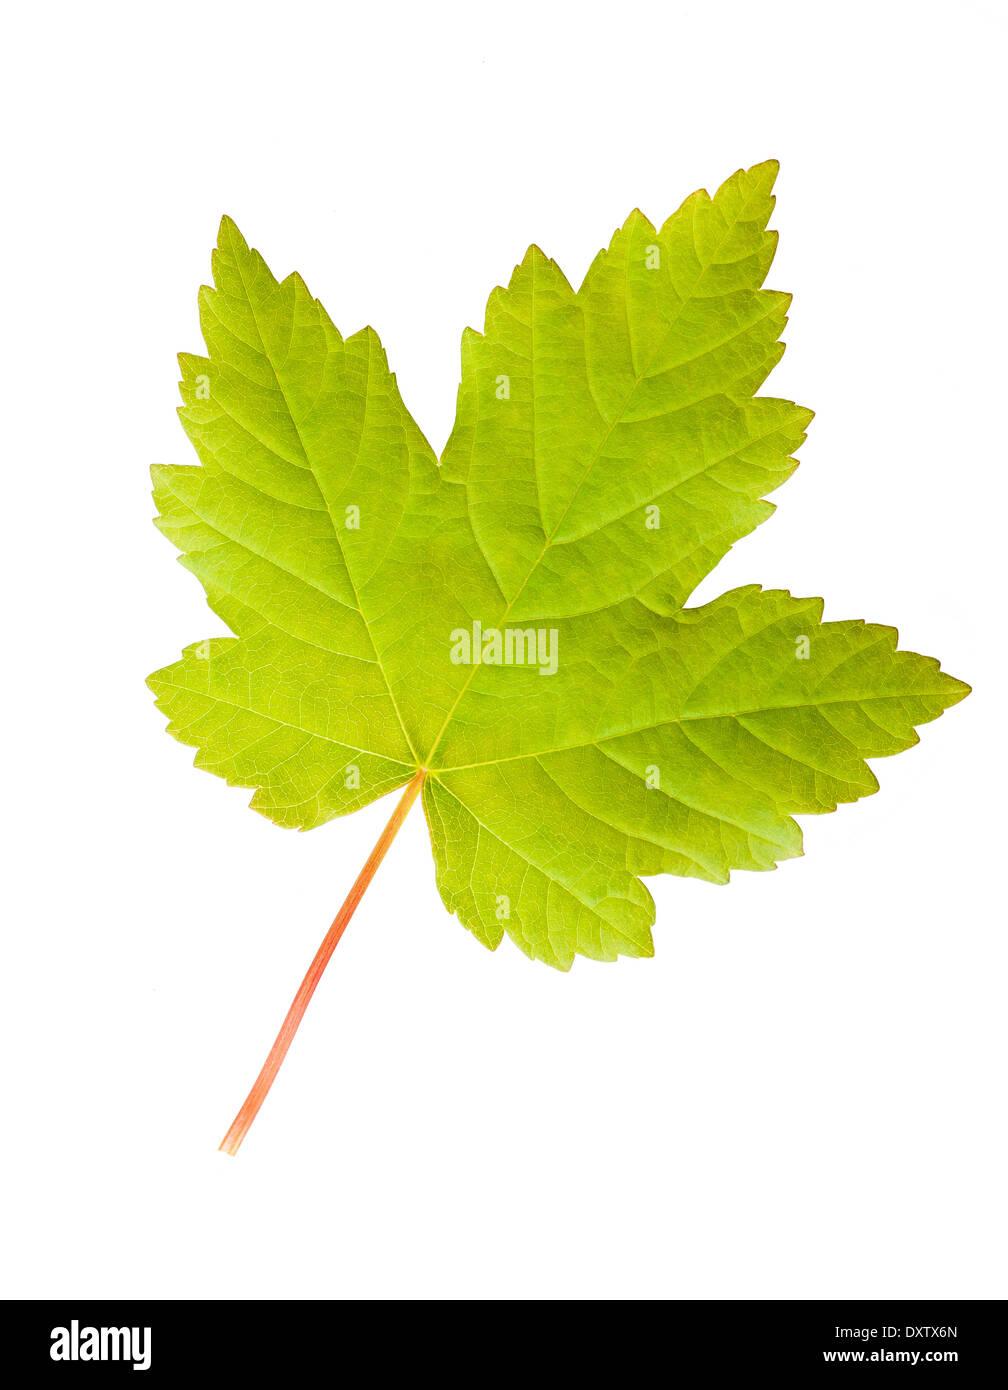 Green maple leaf isolated on white background - Stock Image